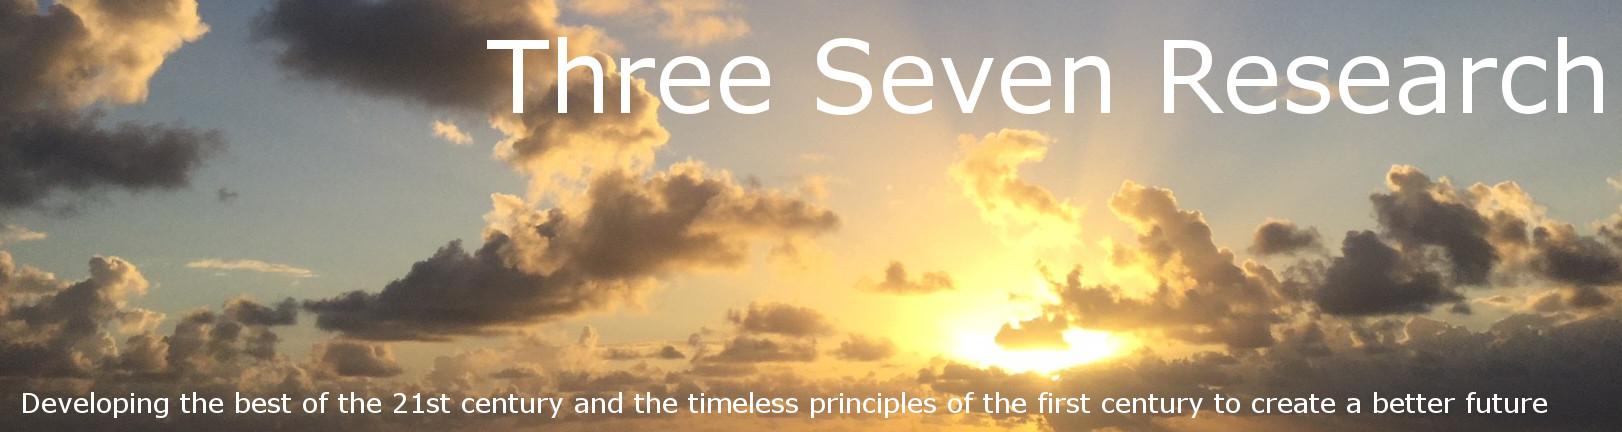 Three Seven Research